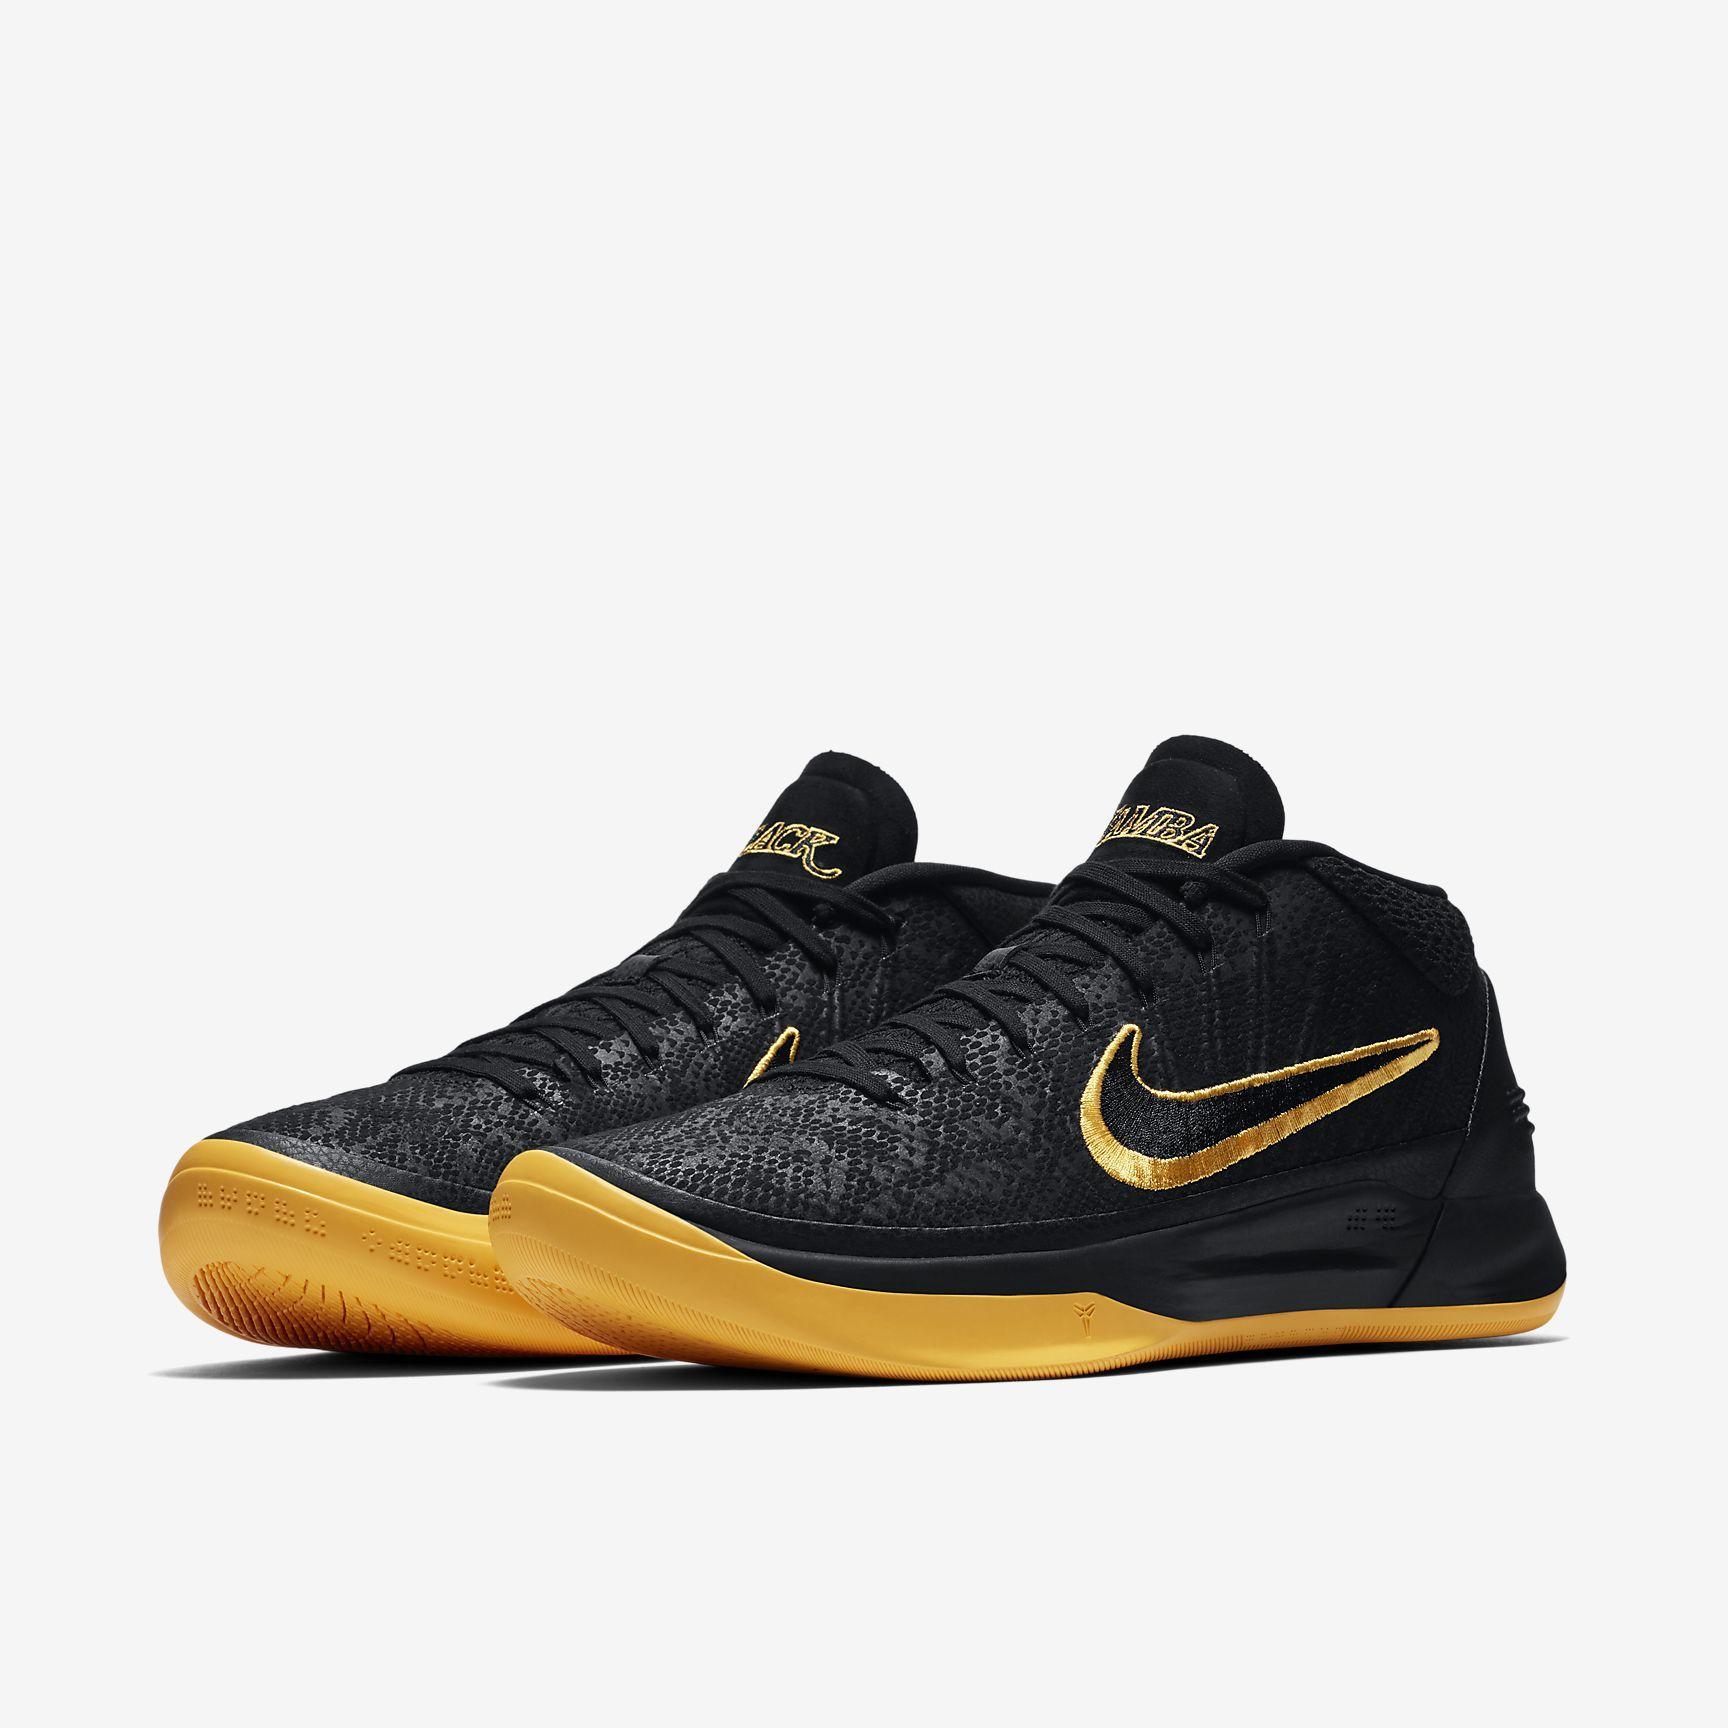 Nike Kobe A.D. Black Mamba Basketball Schuhe Herren